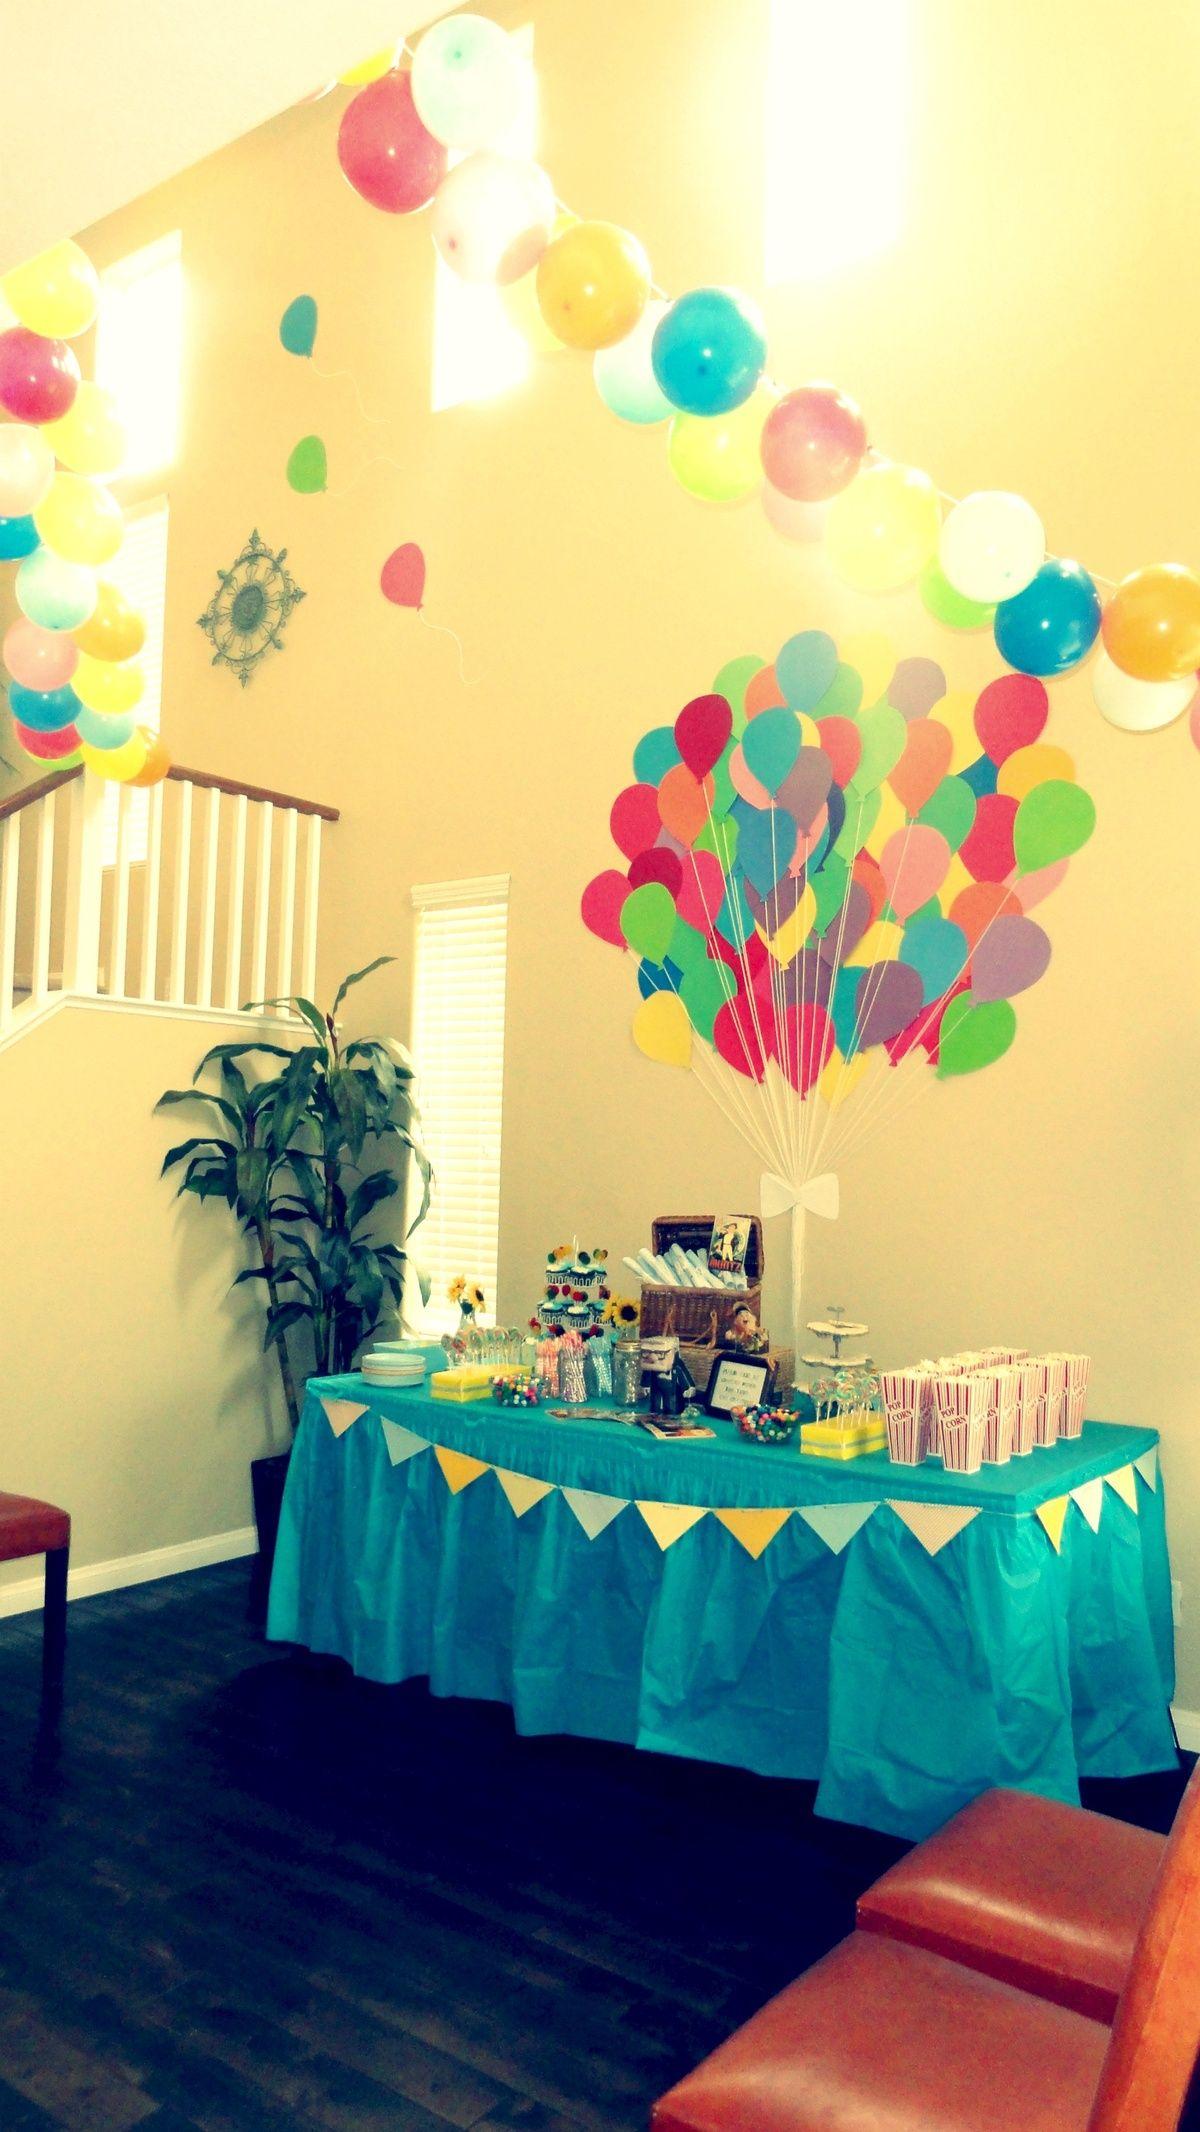 Pin by Karen Atilano on Party Ideas | Pinterest | Birthdays and ...